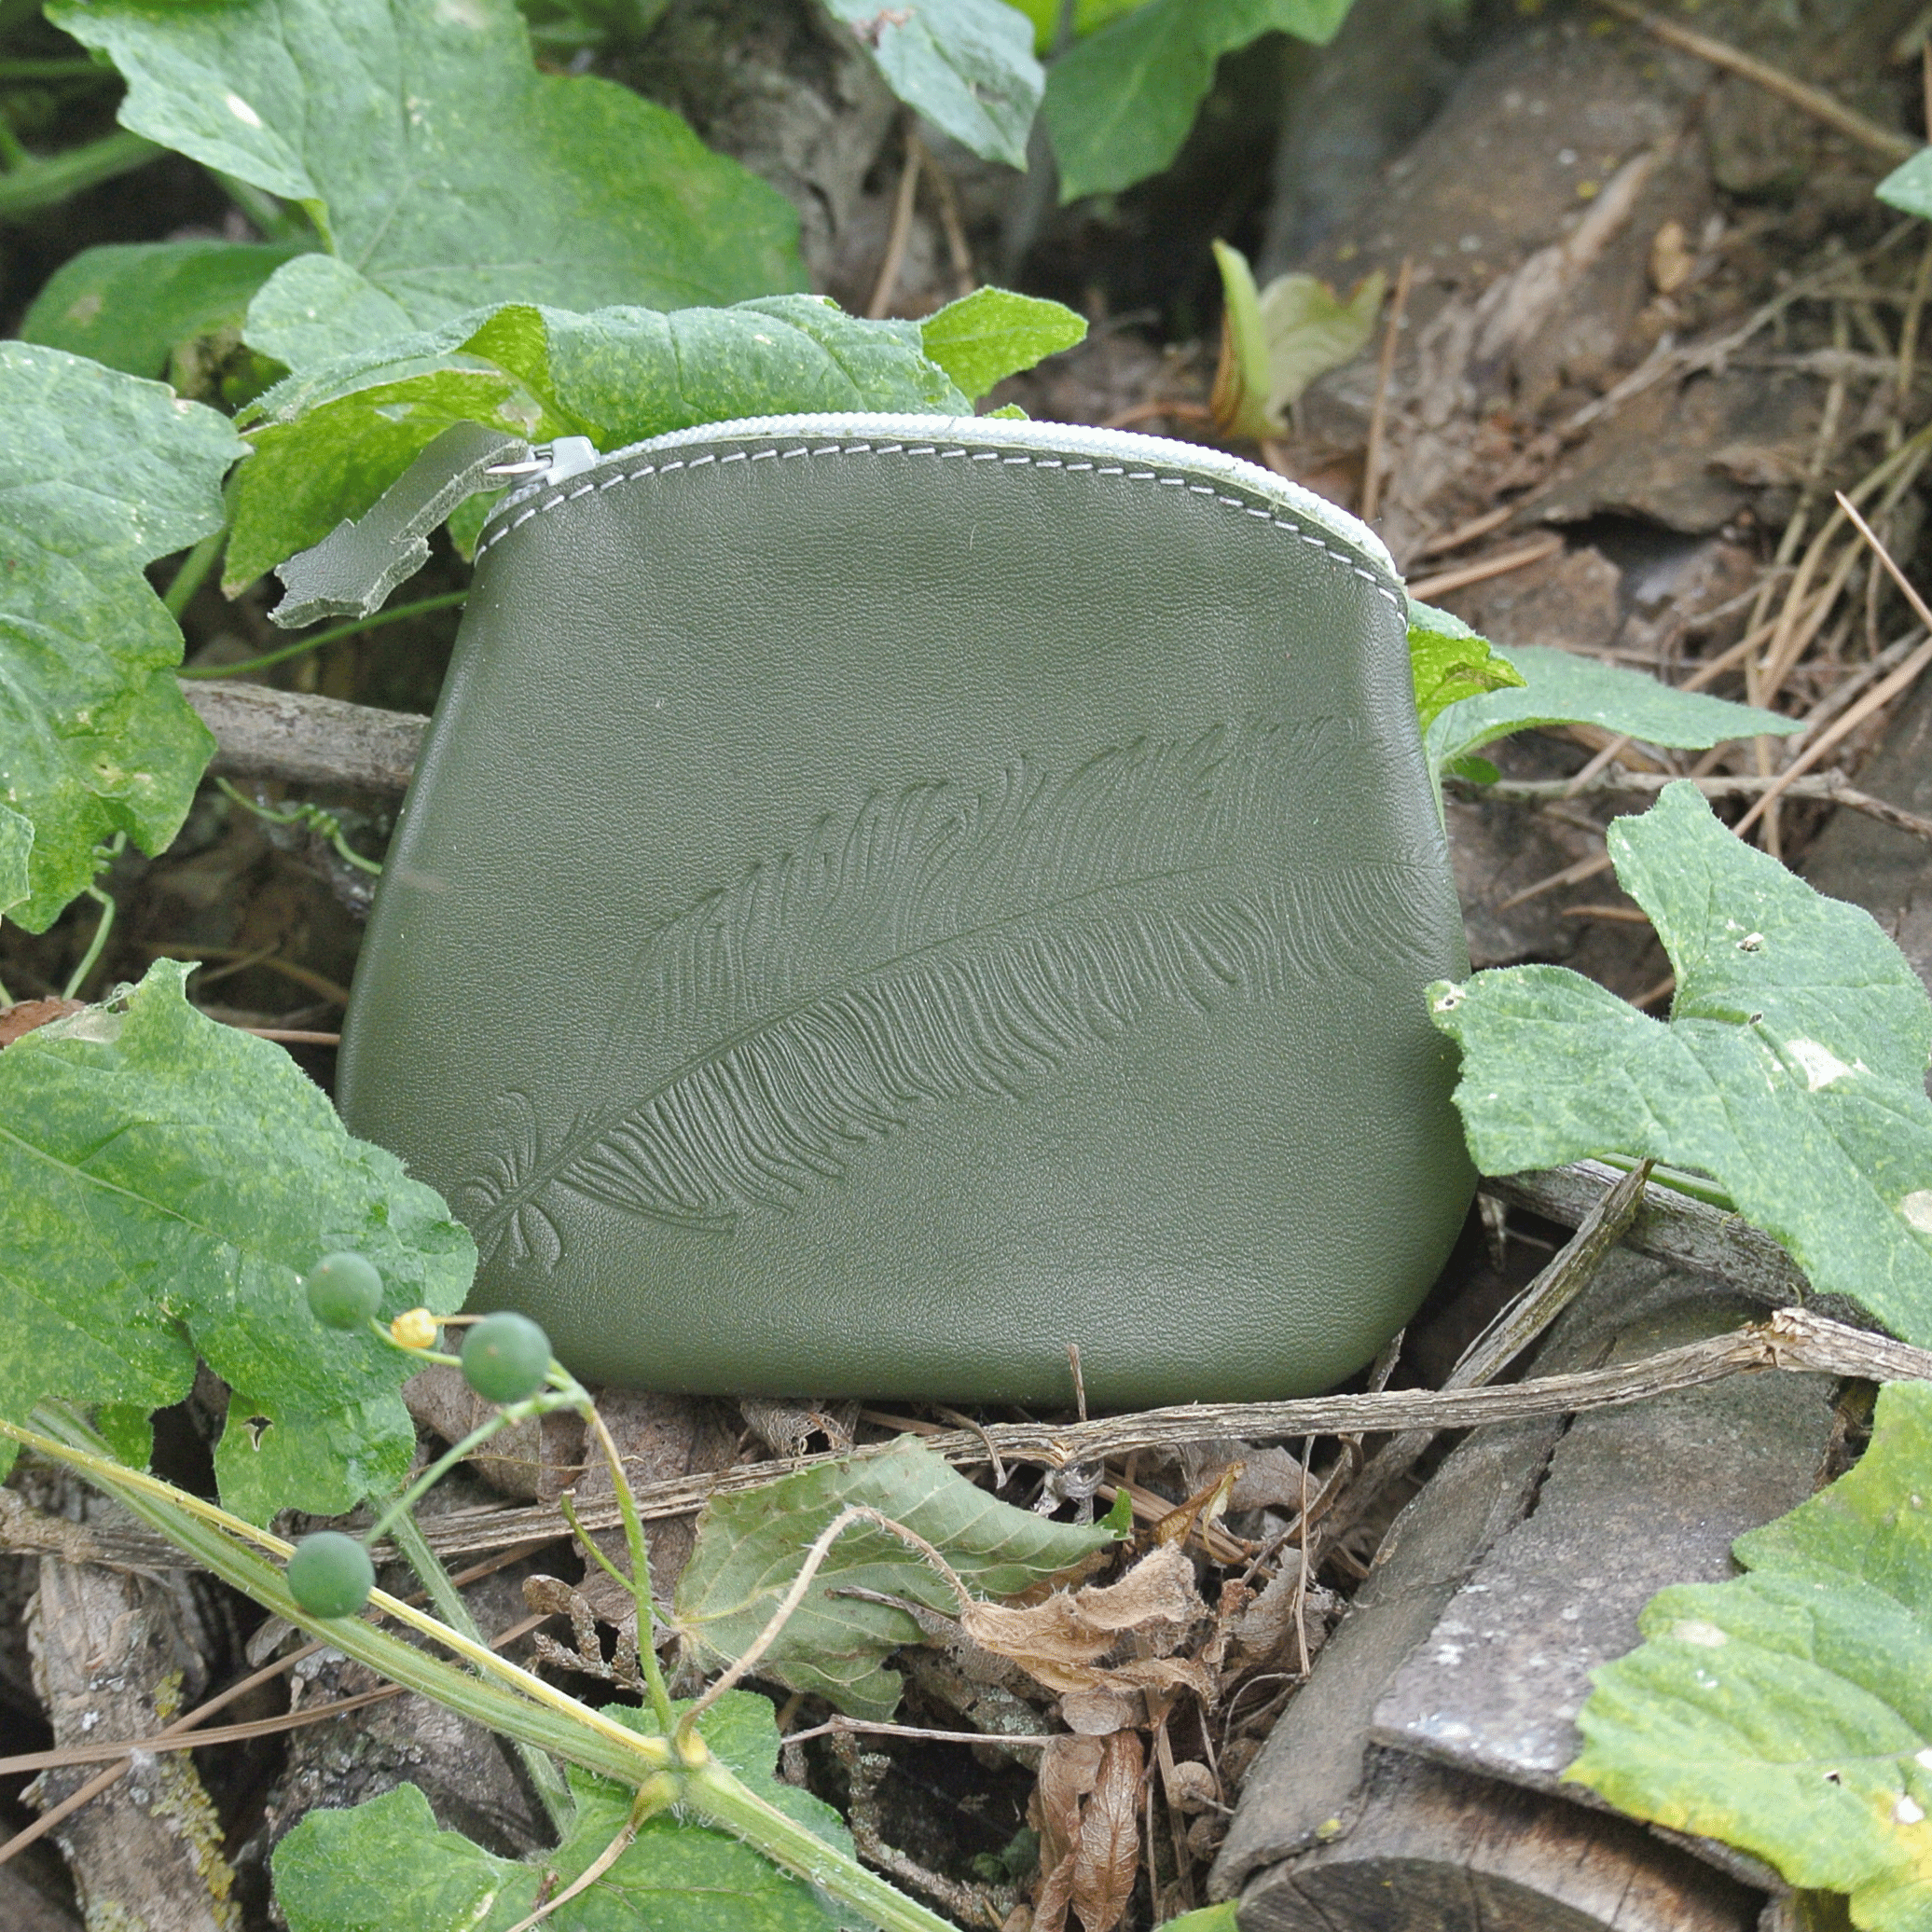 cuirs-fantaisies-la-cartabliere-fabrique-en-france-porte-monnaie-plume-panache-en-cuir-nappa-vert